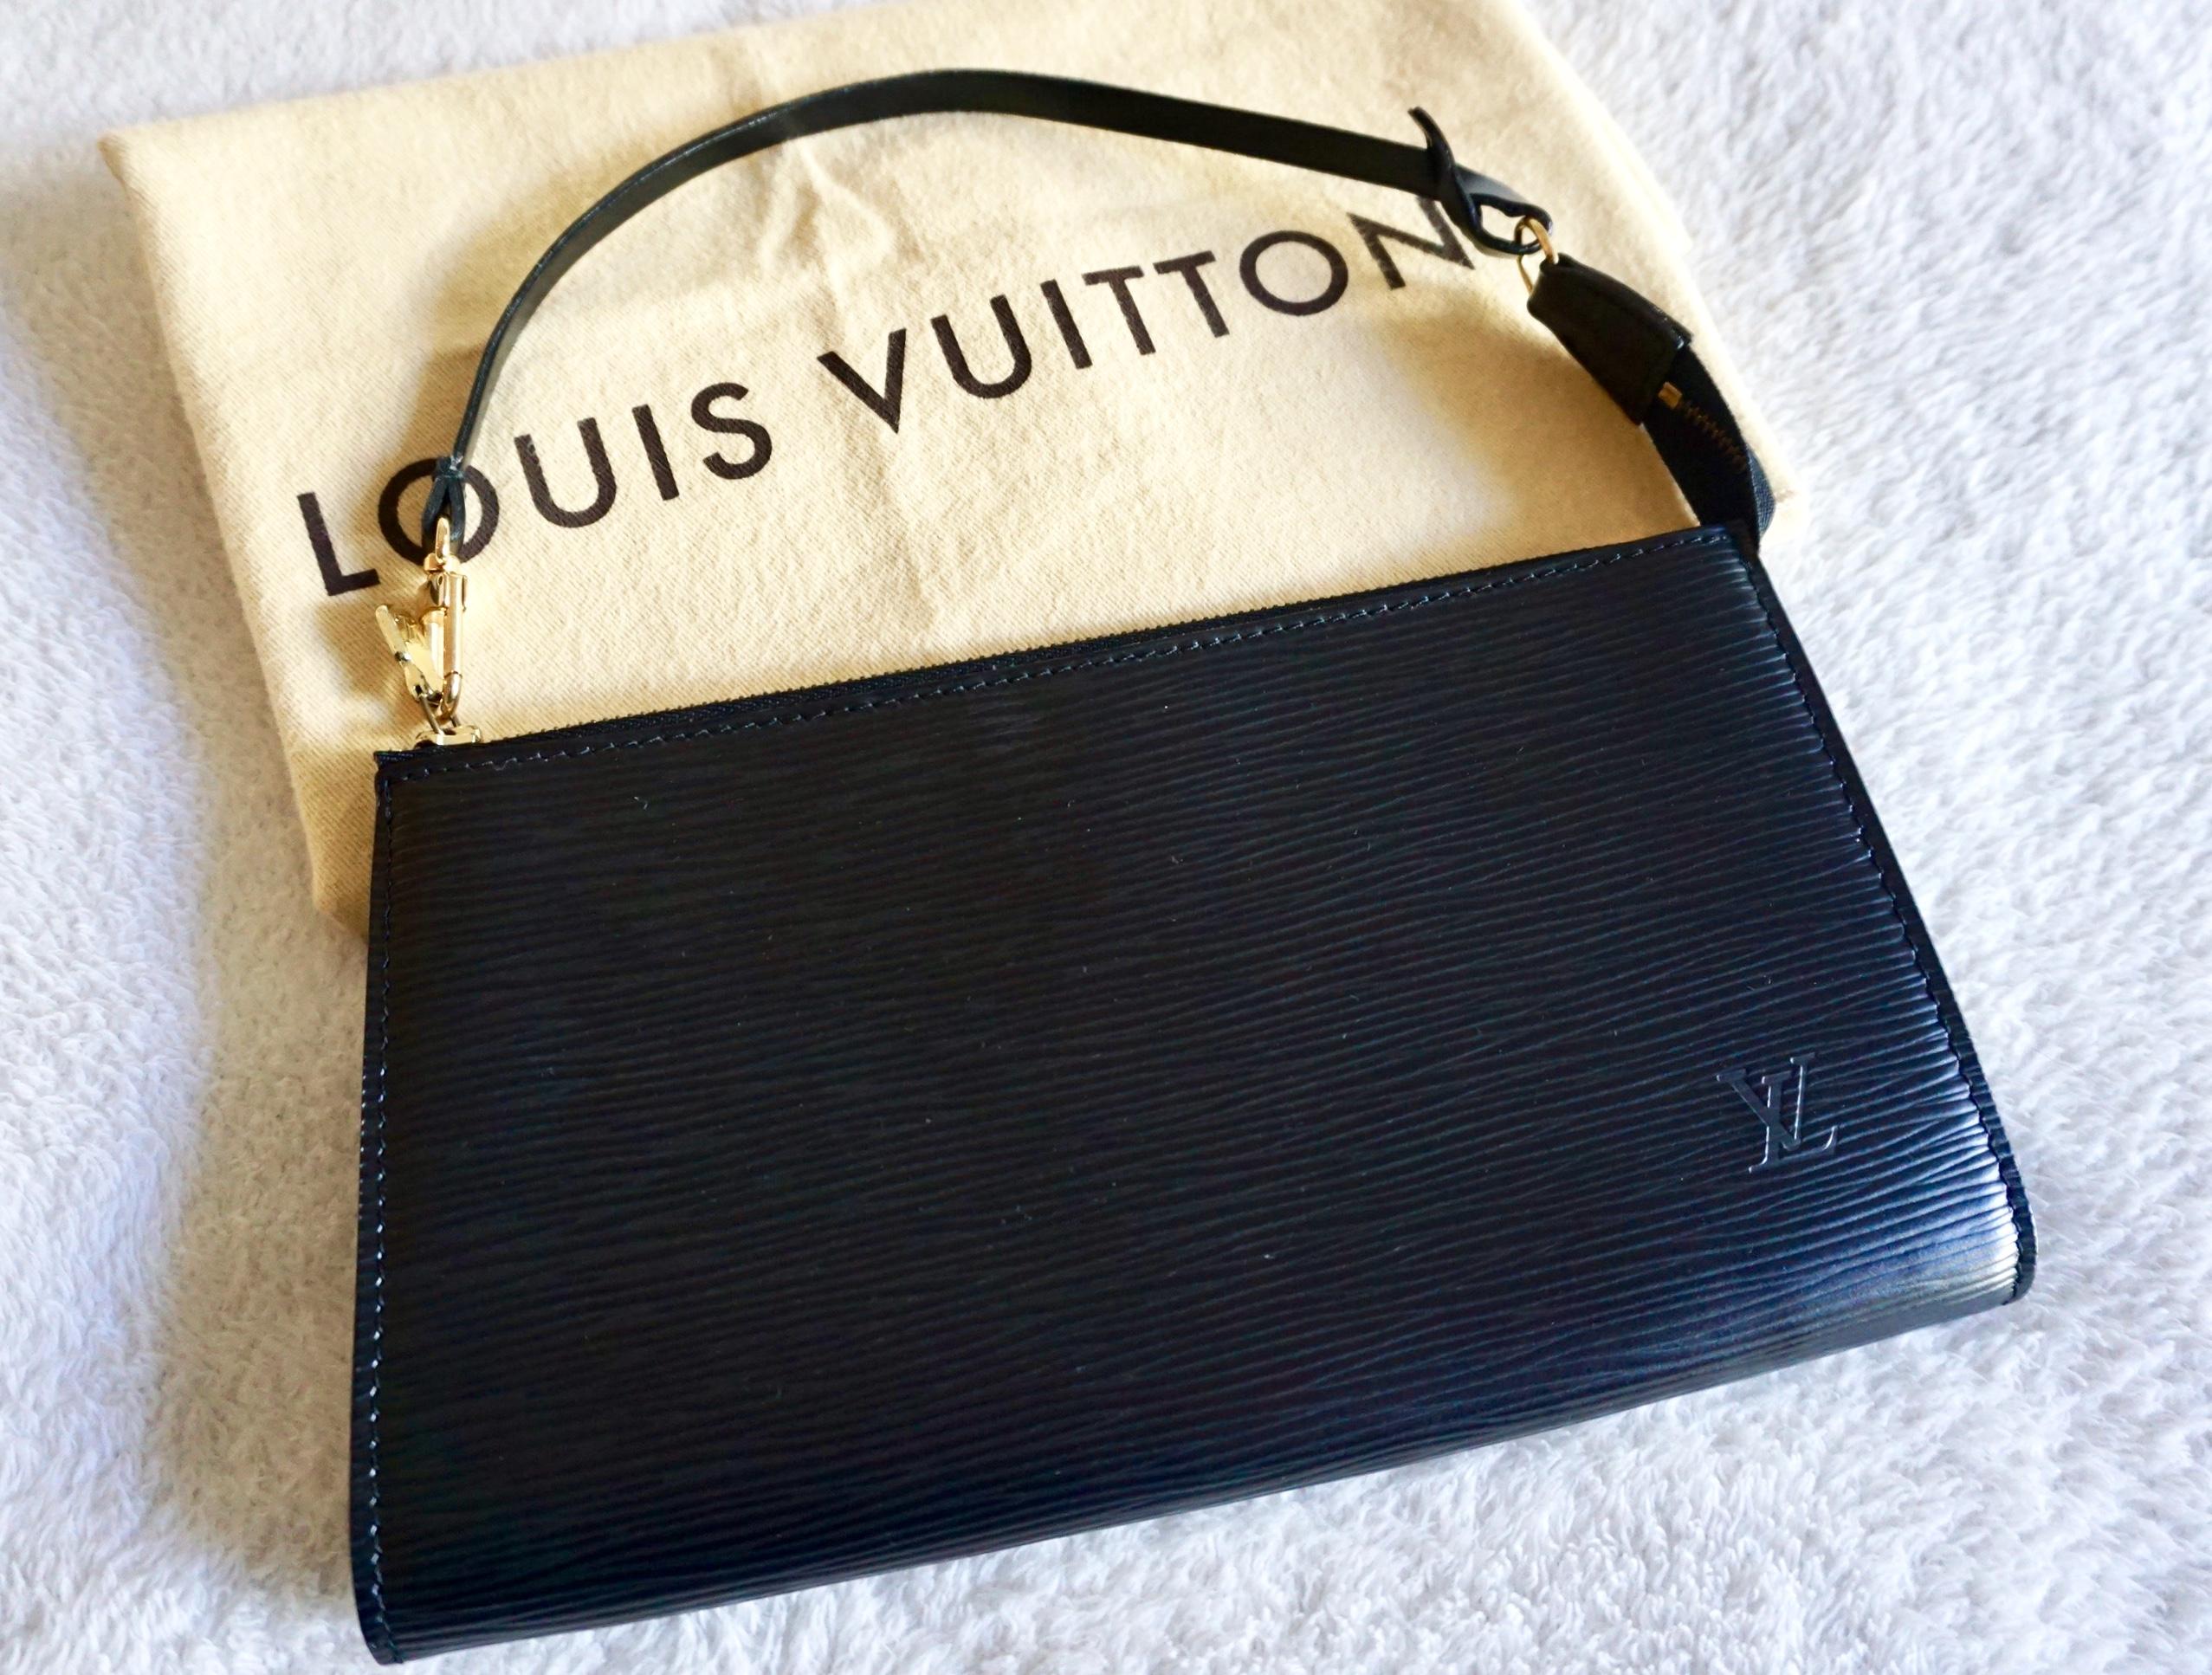 86b6396c9989 Louis Vuitton Black Epi Leather Handbag — brad.erva-doce.info